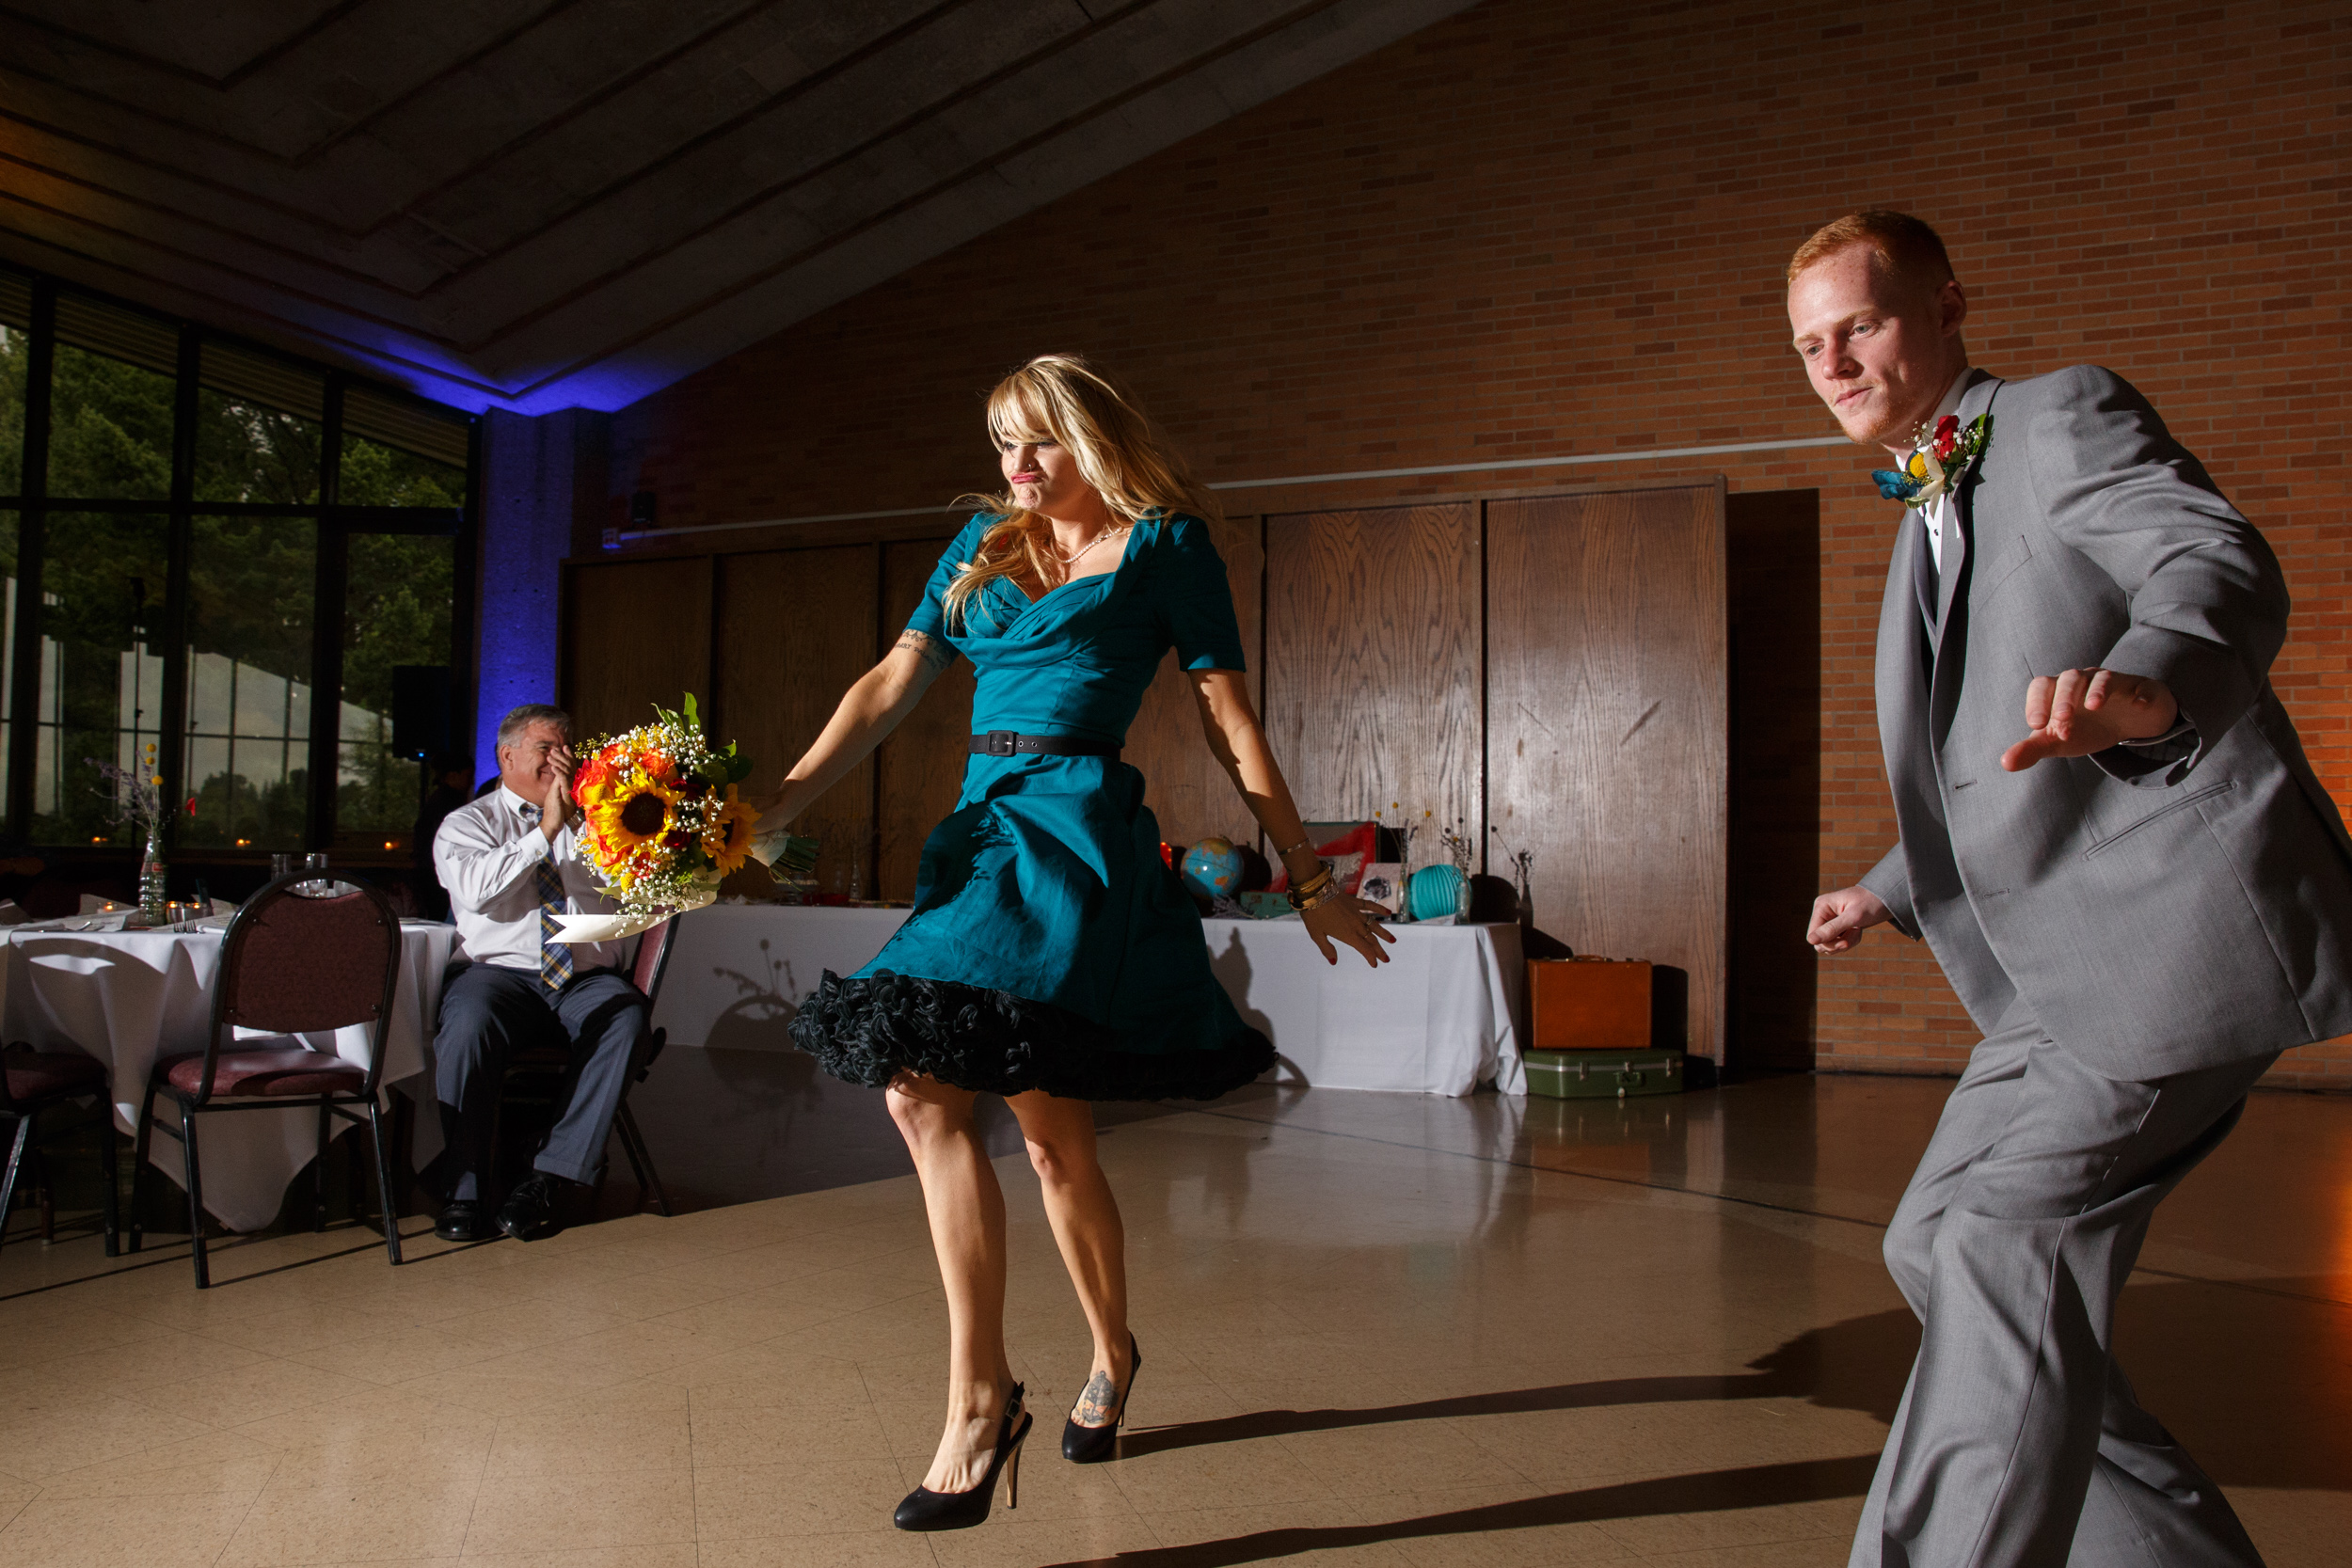 Christian & Sarah wedding photography by Brian milo-219.jpg